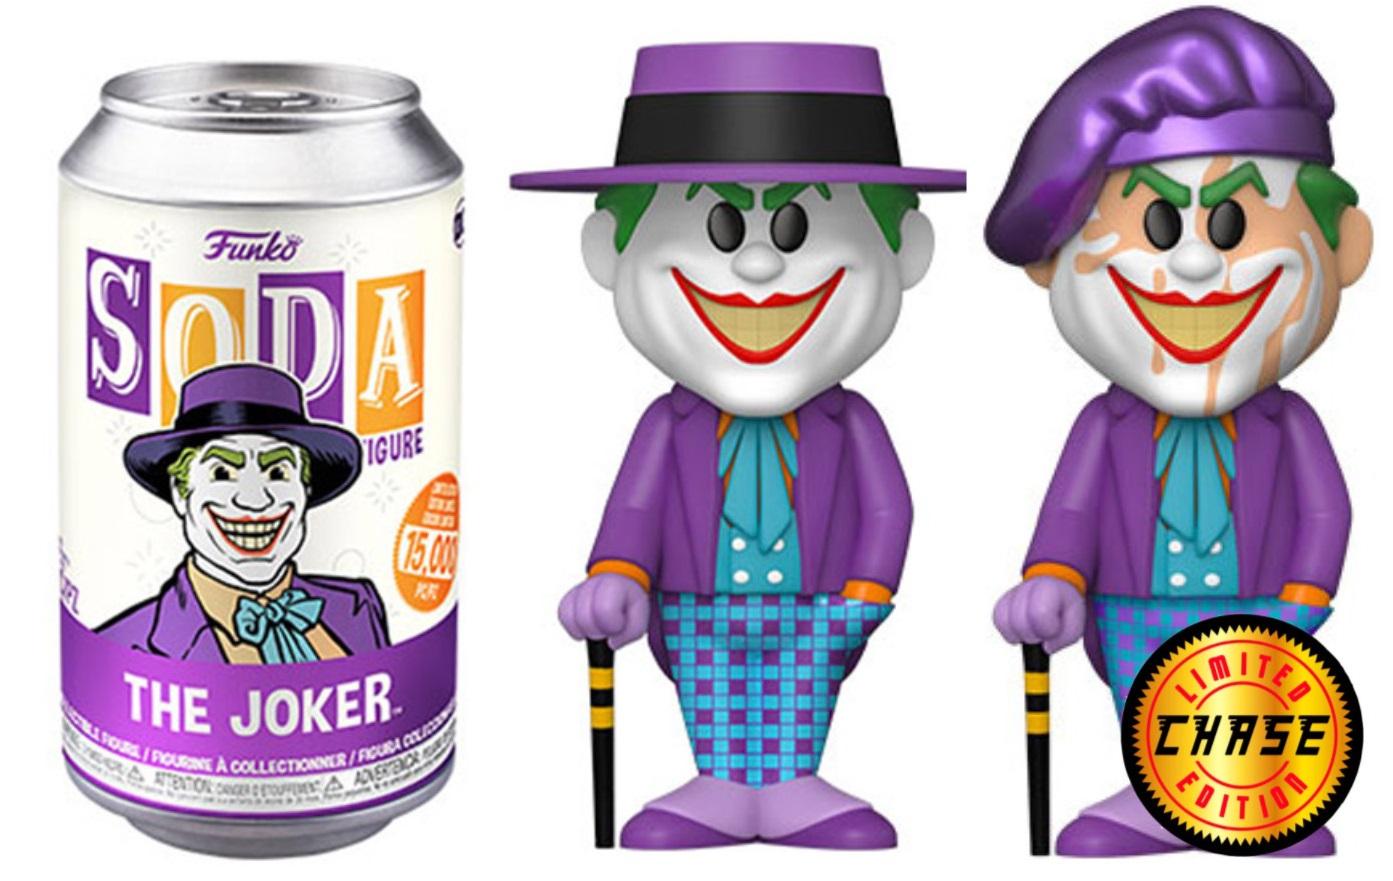 Funko Soda The Joker 1989